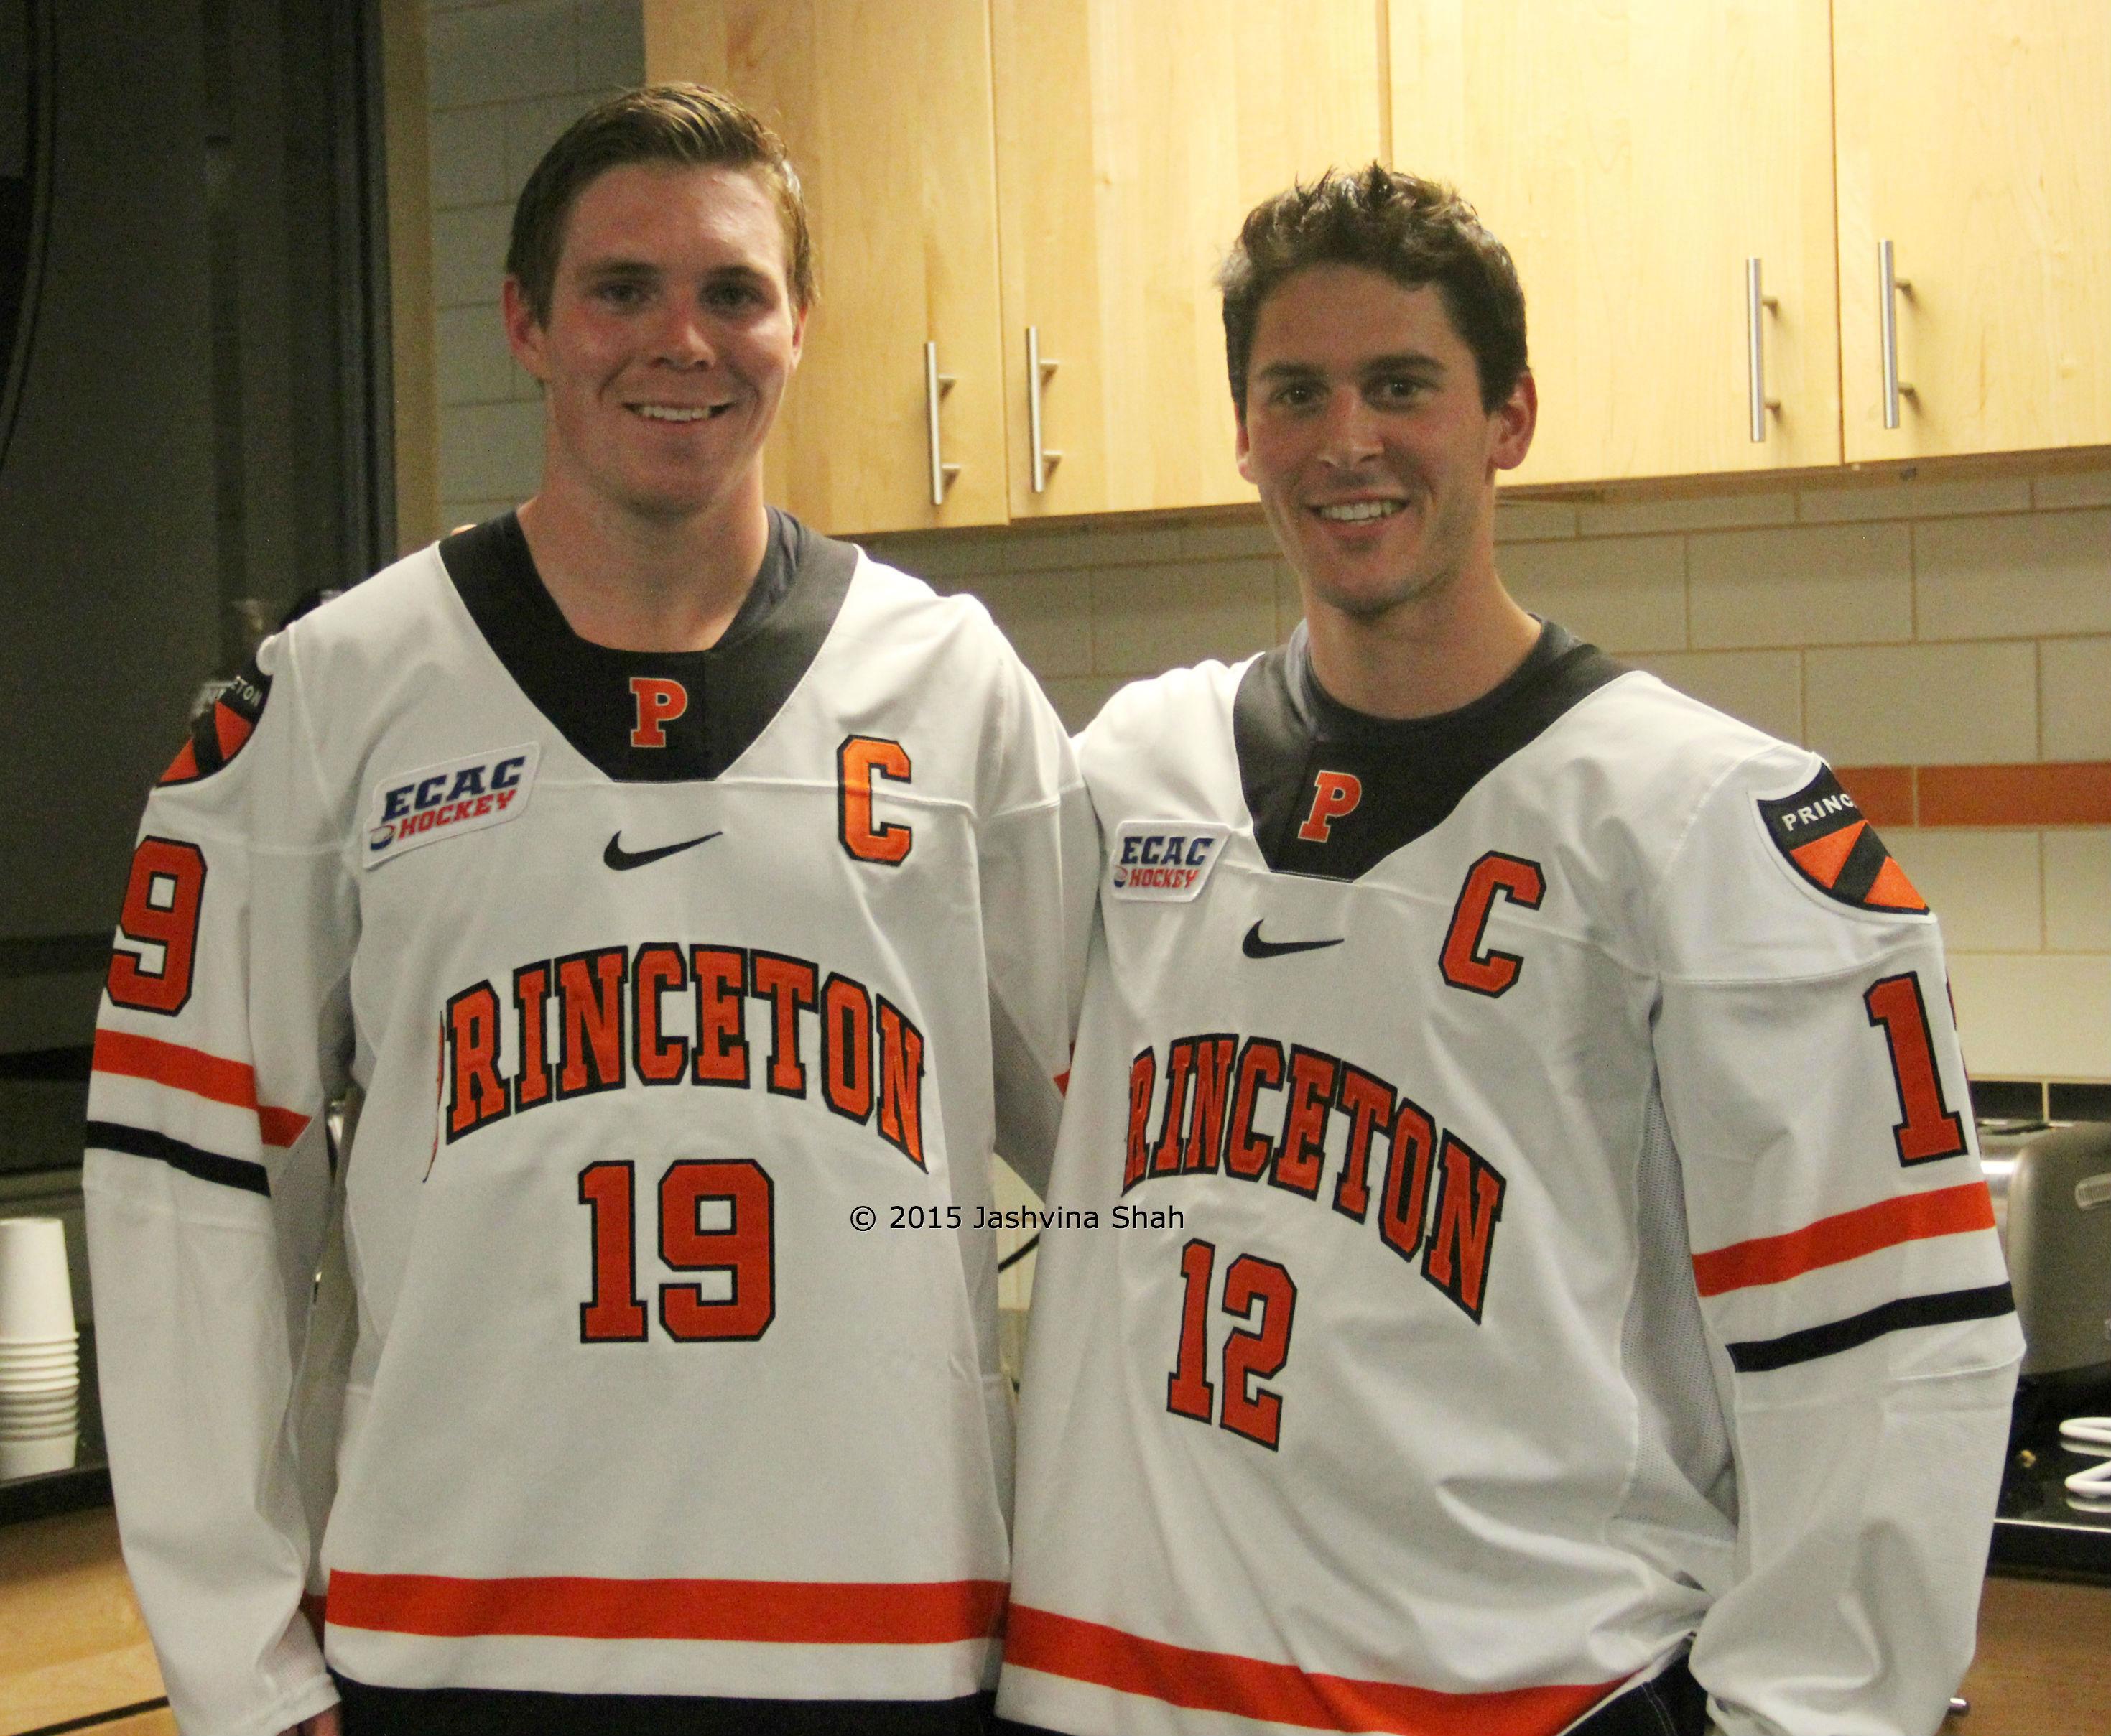 Princeton Enters Season With New Jerseys